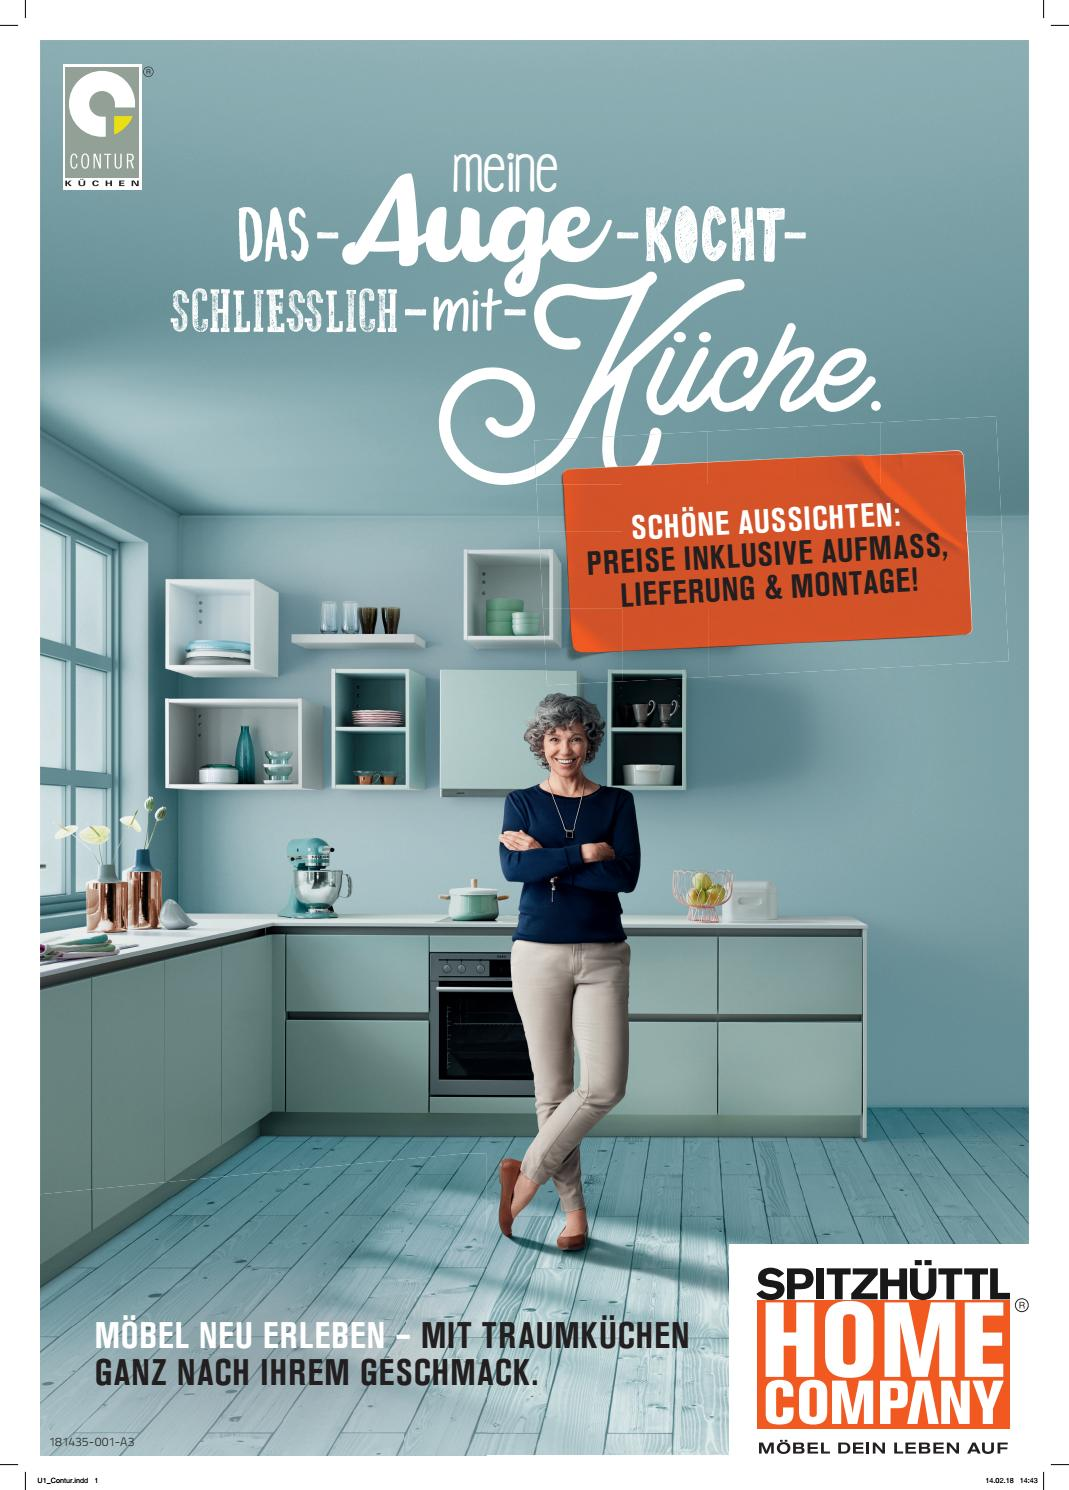 contur k che katalog von der spitzh ttl home company bei w rzburg by spitzh ttl home company issuu. Black Bedroom Furniture Sets. Home Design Ideas